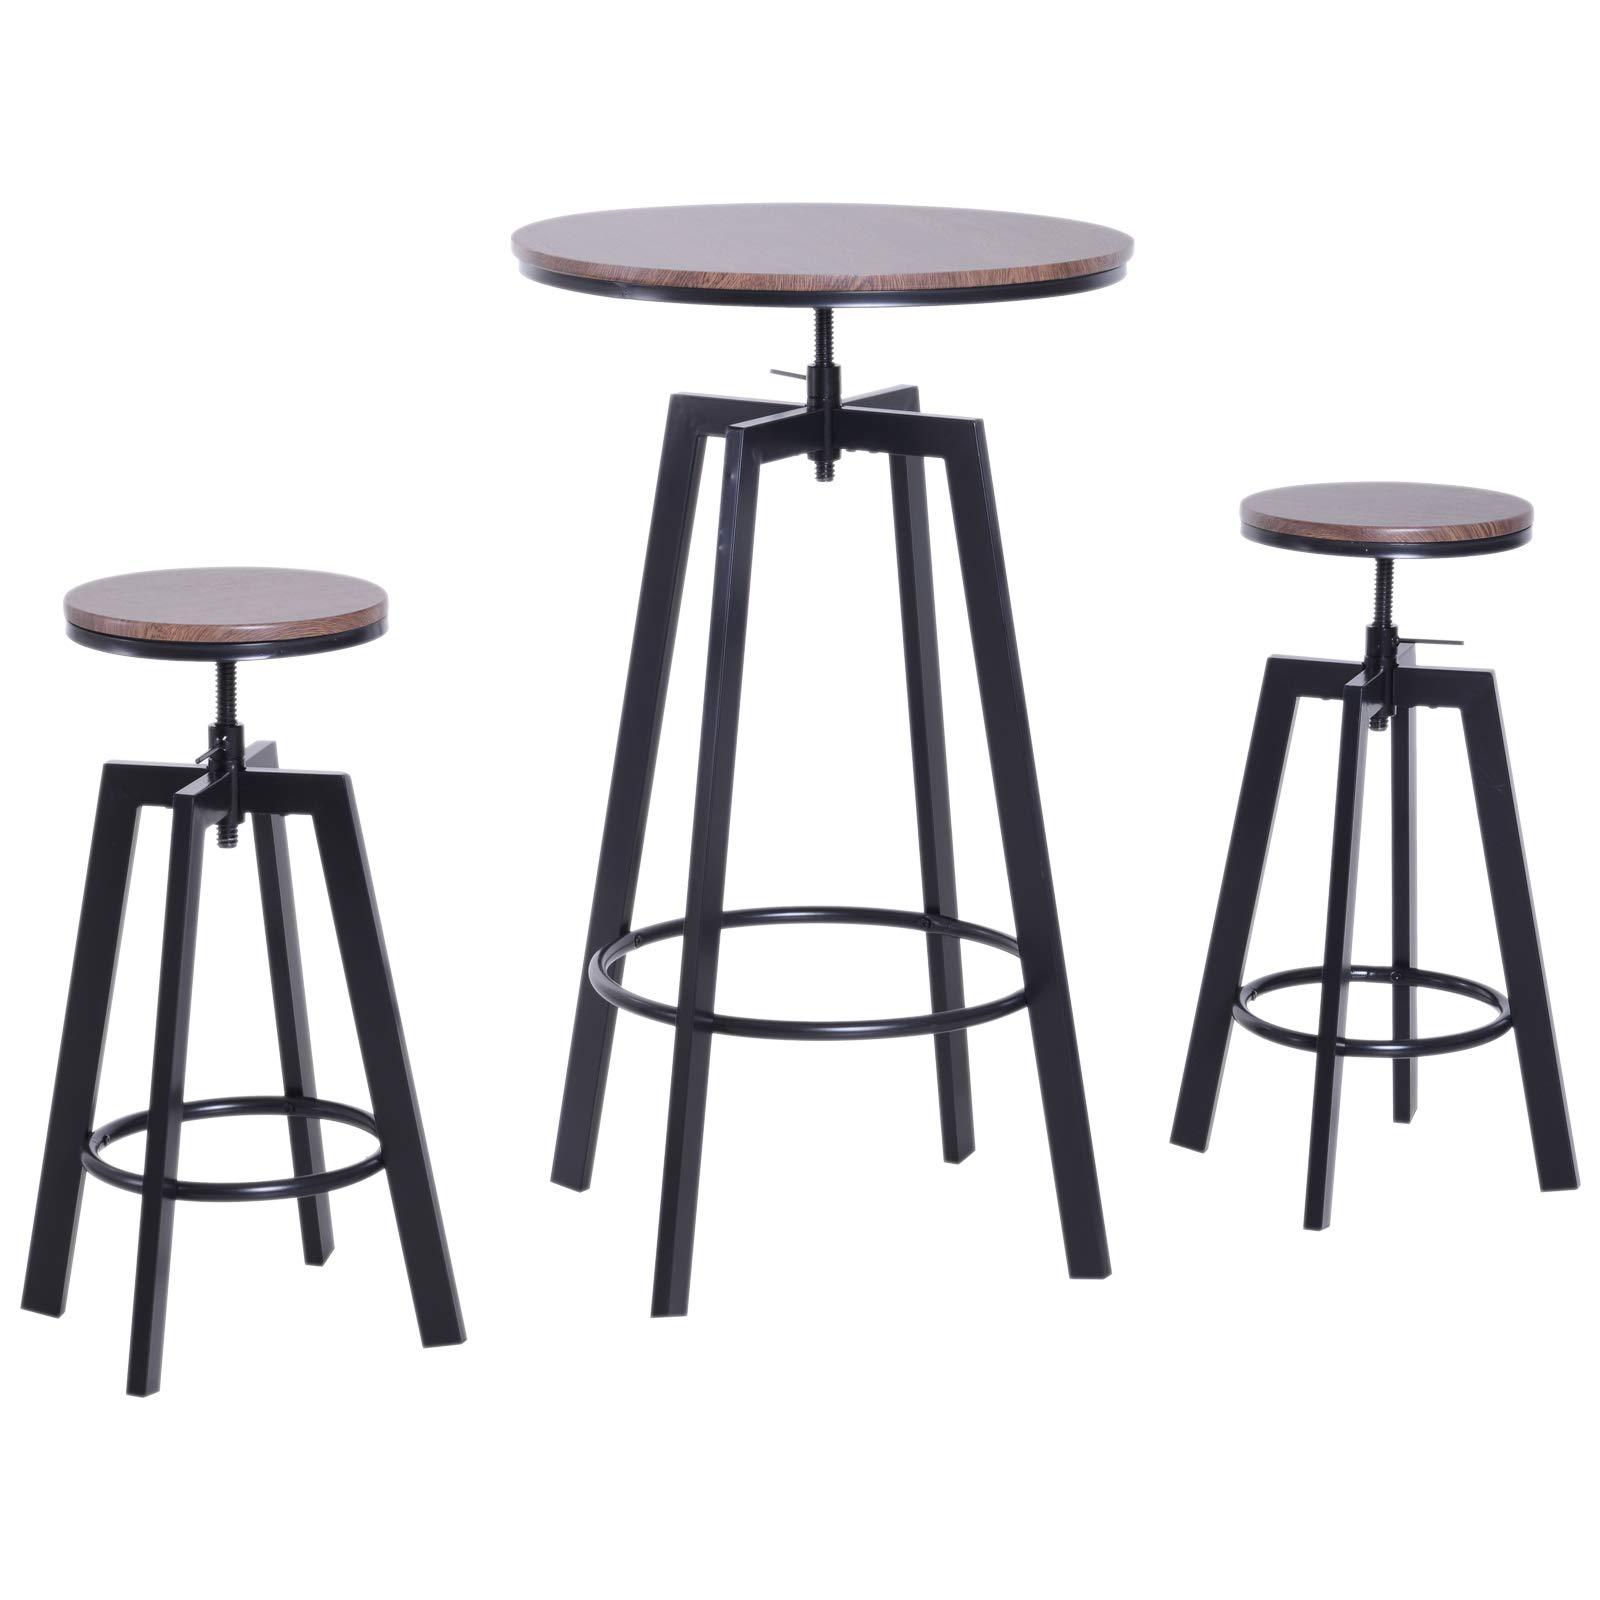 3 Piece Bar Height Adjustable Industrial Modern Indoor Bistro Table Set by HOMCOM